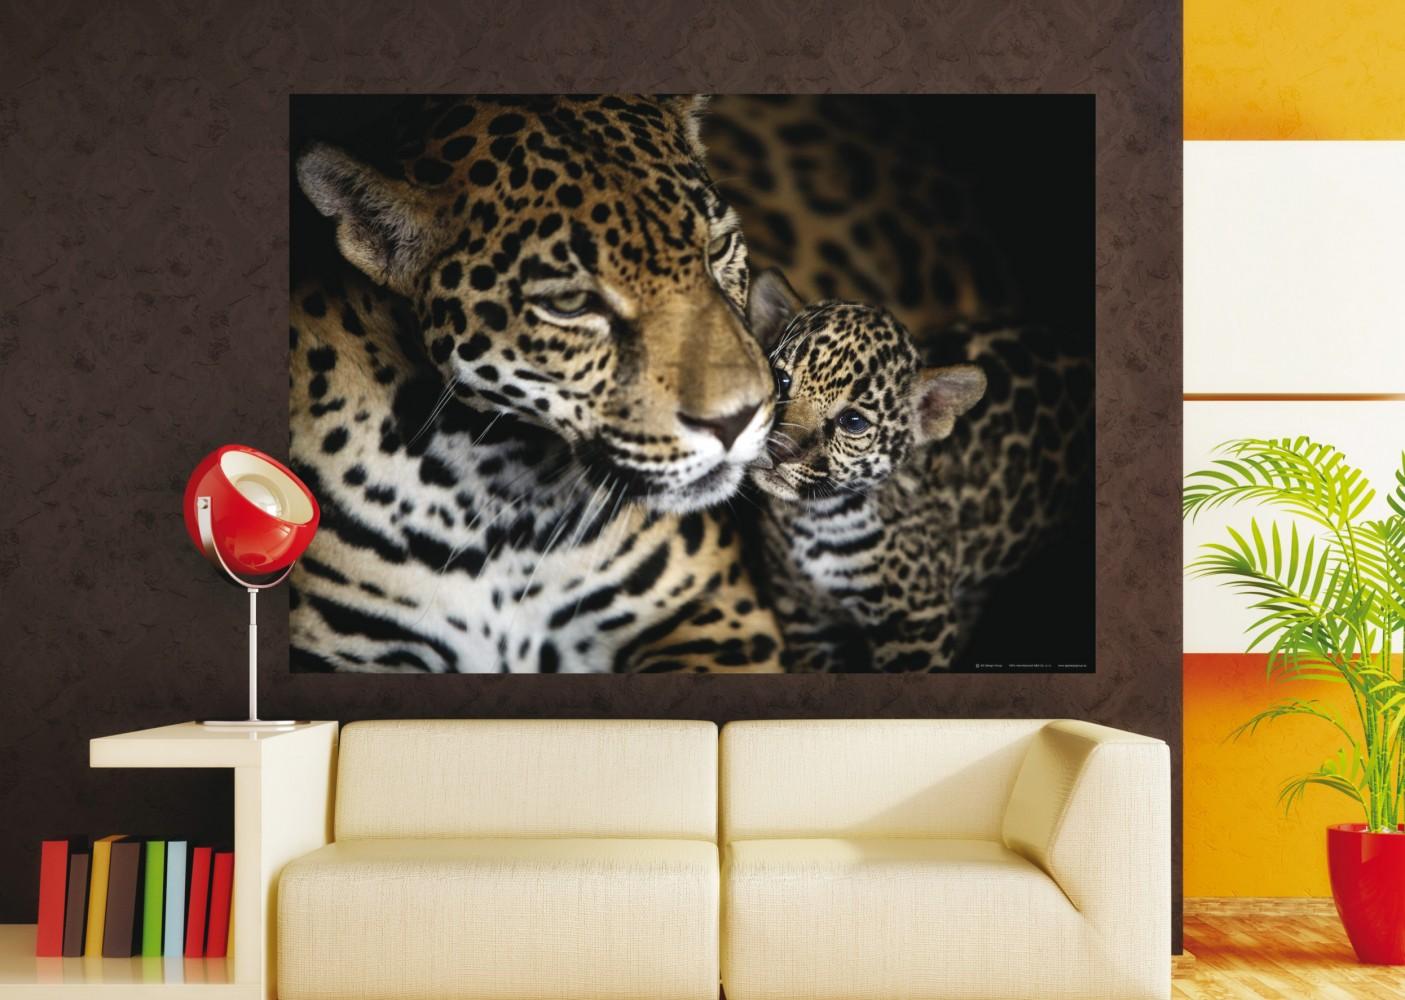 xxl poster fototapete tapete leopard wildniss safari panther foto 160 cm x 115 cm. Black Bedroom Furniture Sets. Home Design Ideas